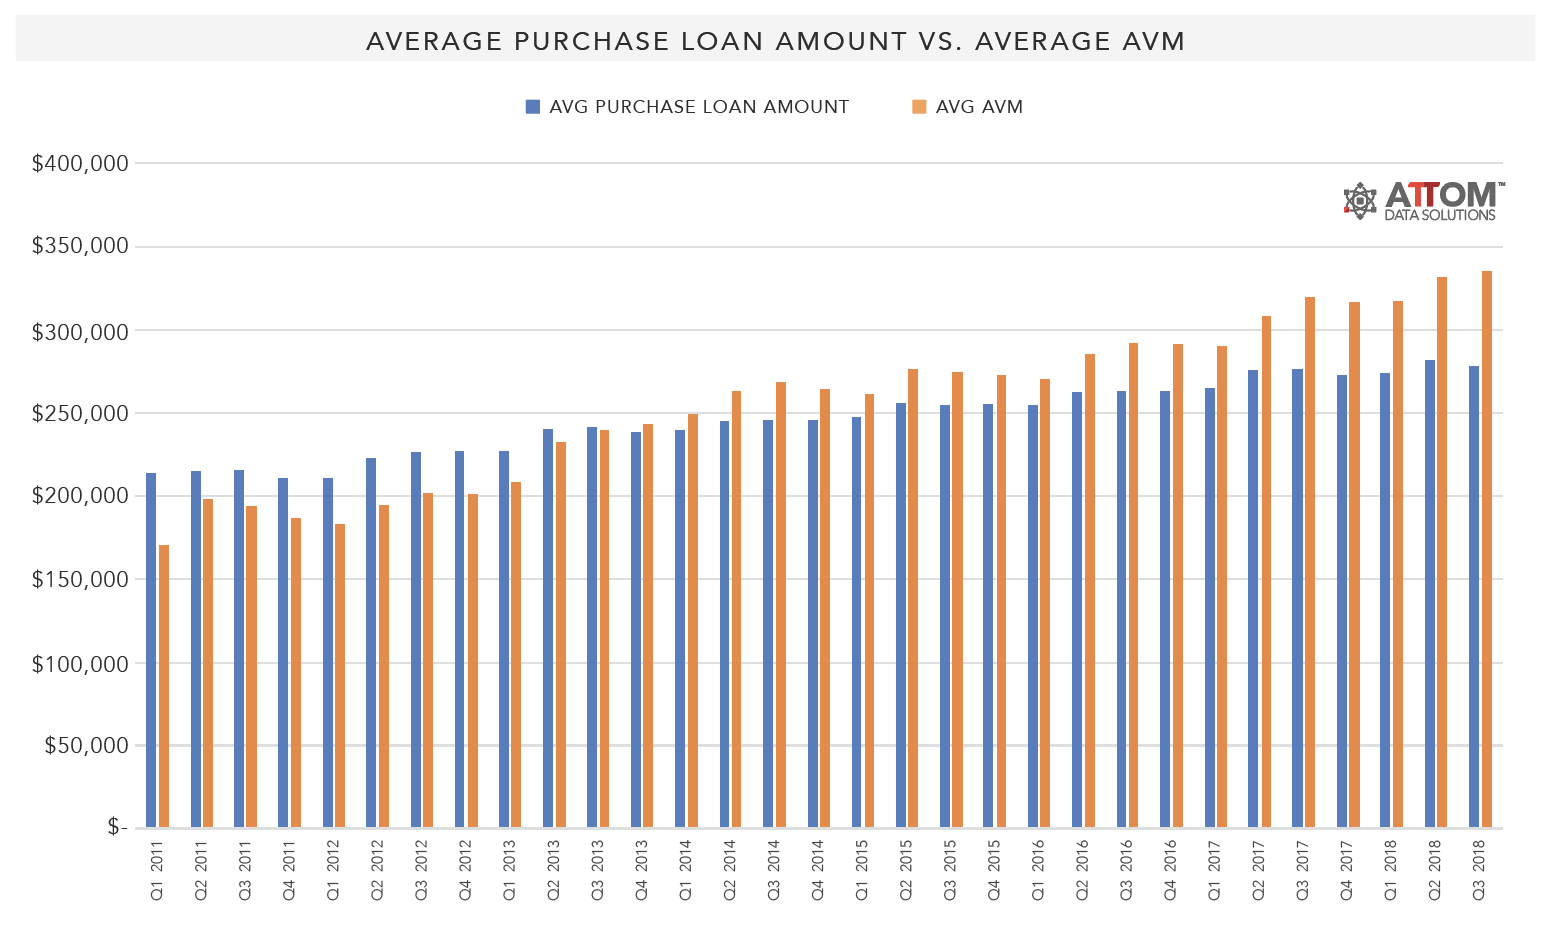 Average_Purchase_Loan_Amount_vs_Average_AVM